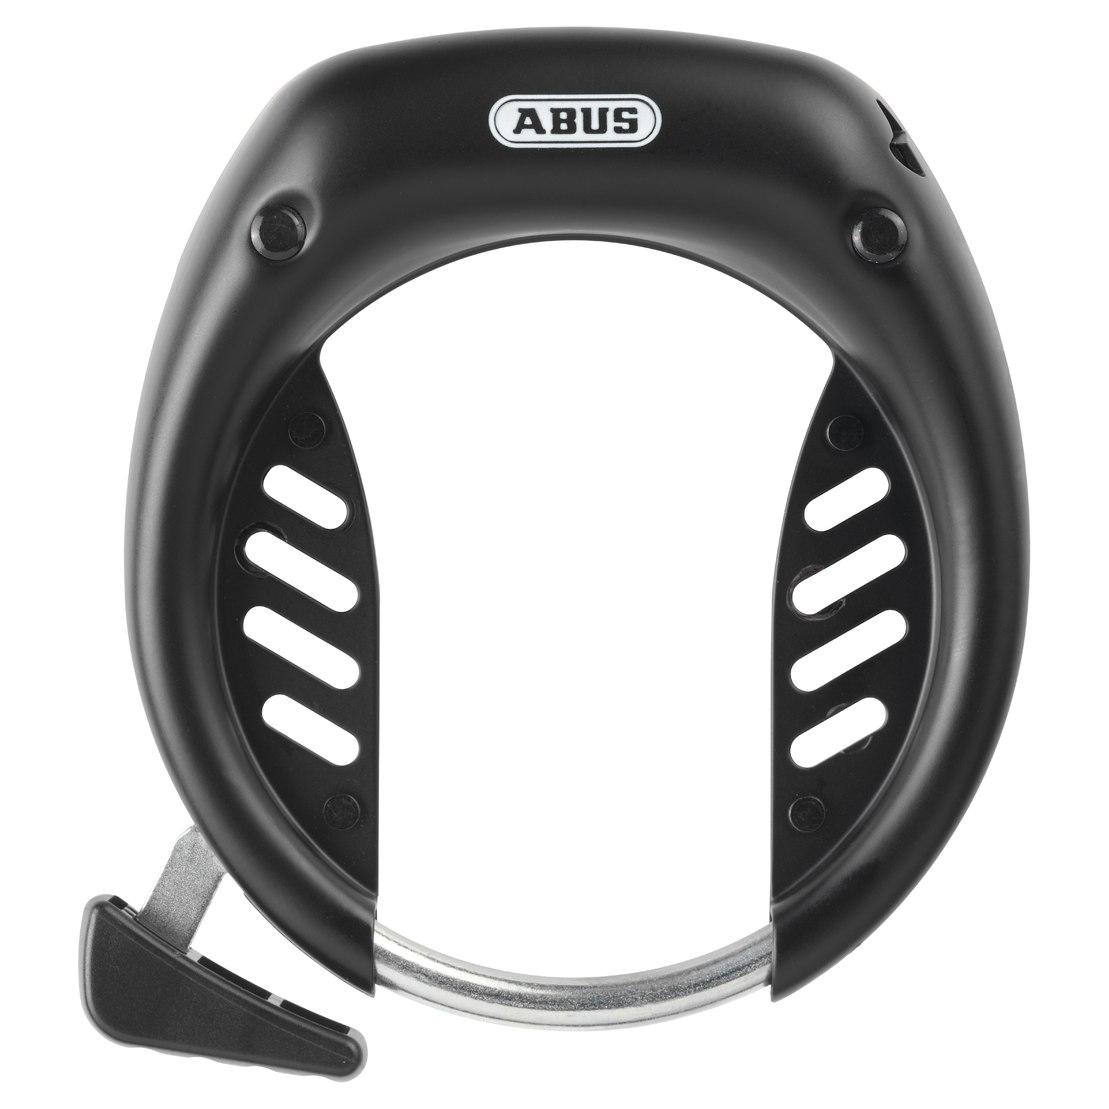 ABUS 565 Shield Frame Lock